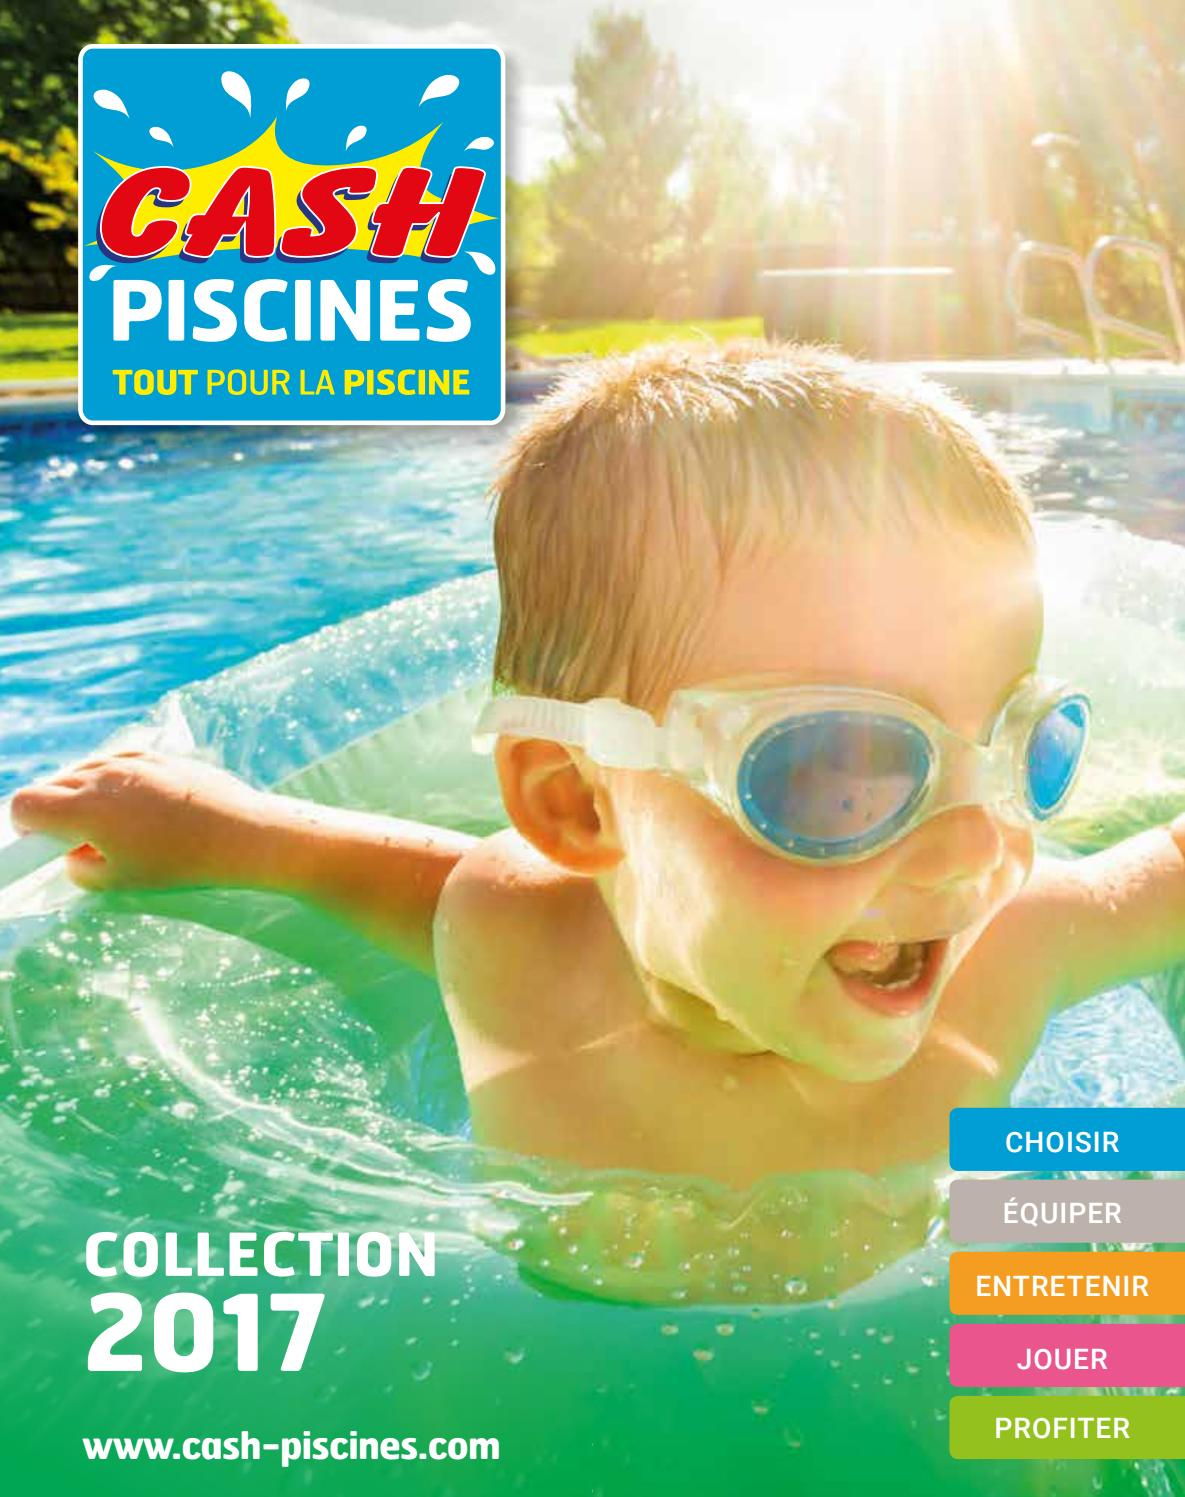 Catalogue Cash Piscine 2017 By Octave Octave - Issuu concernant Cash Piscine Cahors